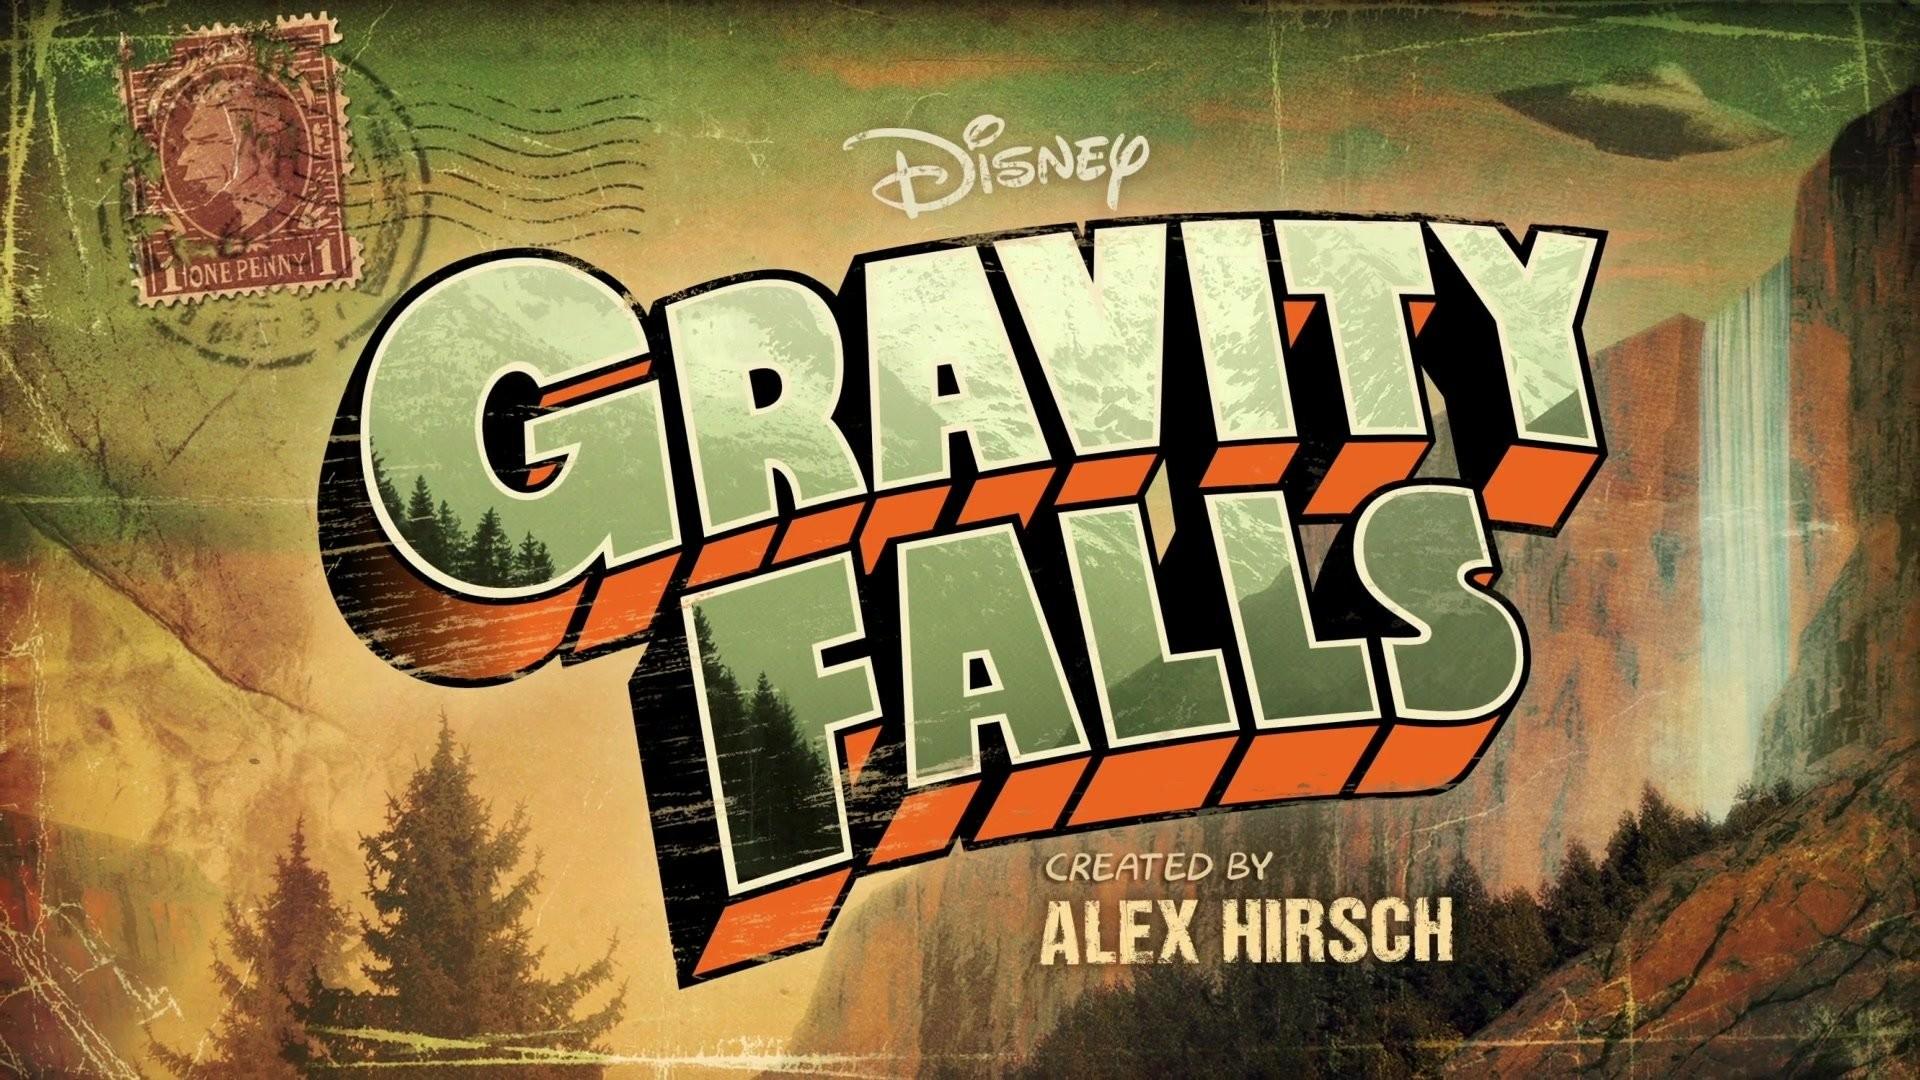 Mobile Wallpapers Gravity Falls Gravity Falls Wallpaper 183 ① Download Free Cool Wallpapers